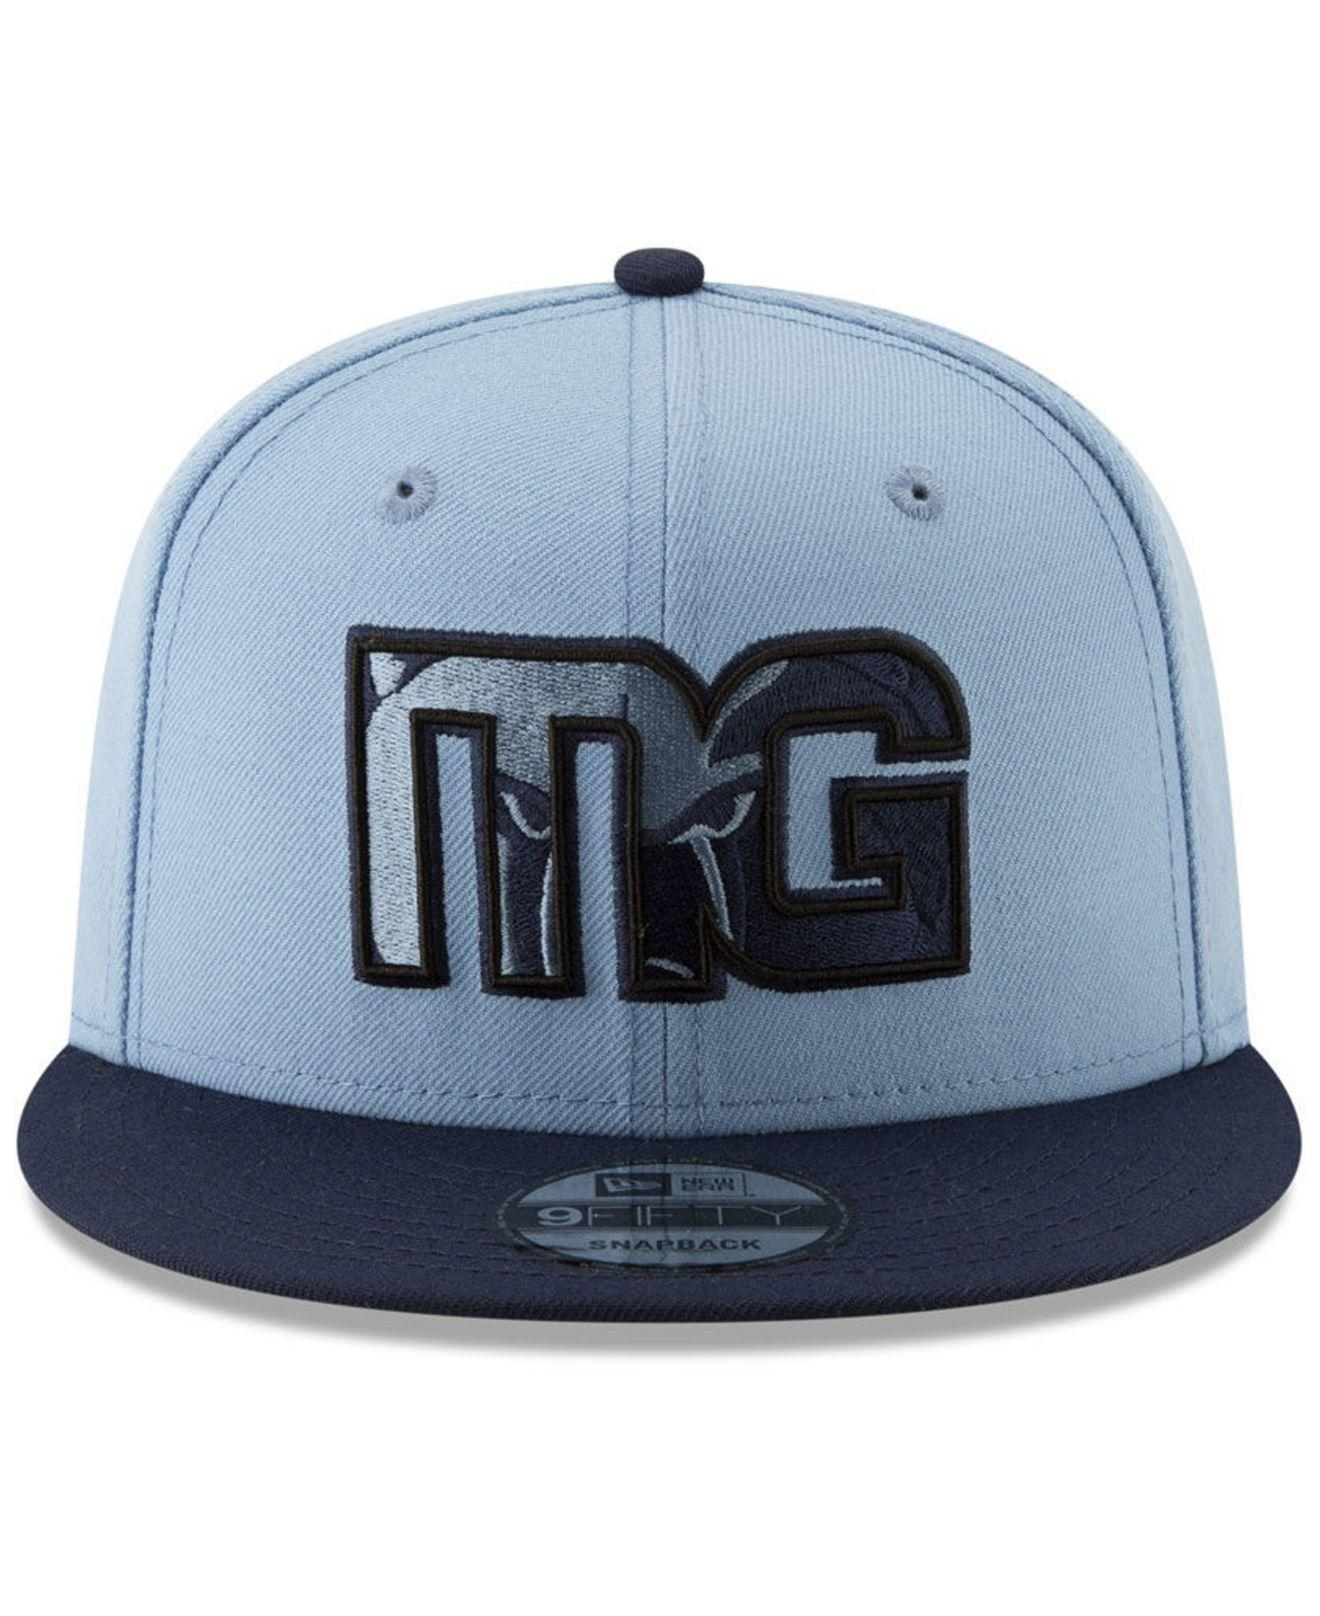 new styles 89779 1a1e2 Lyst - KTZ Memphis Grizzlies Light City Combo 9fifty Snapback Cap in Blue  for Men